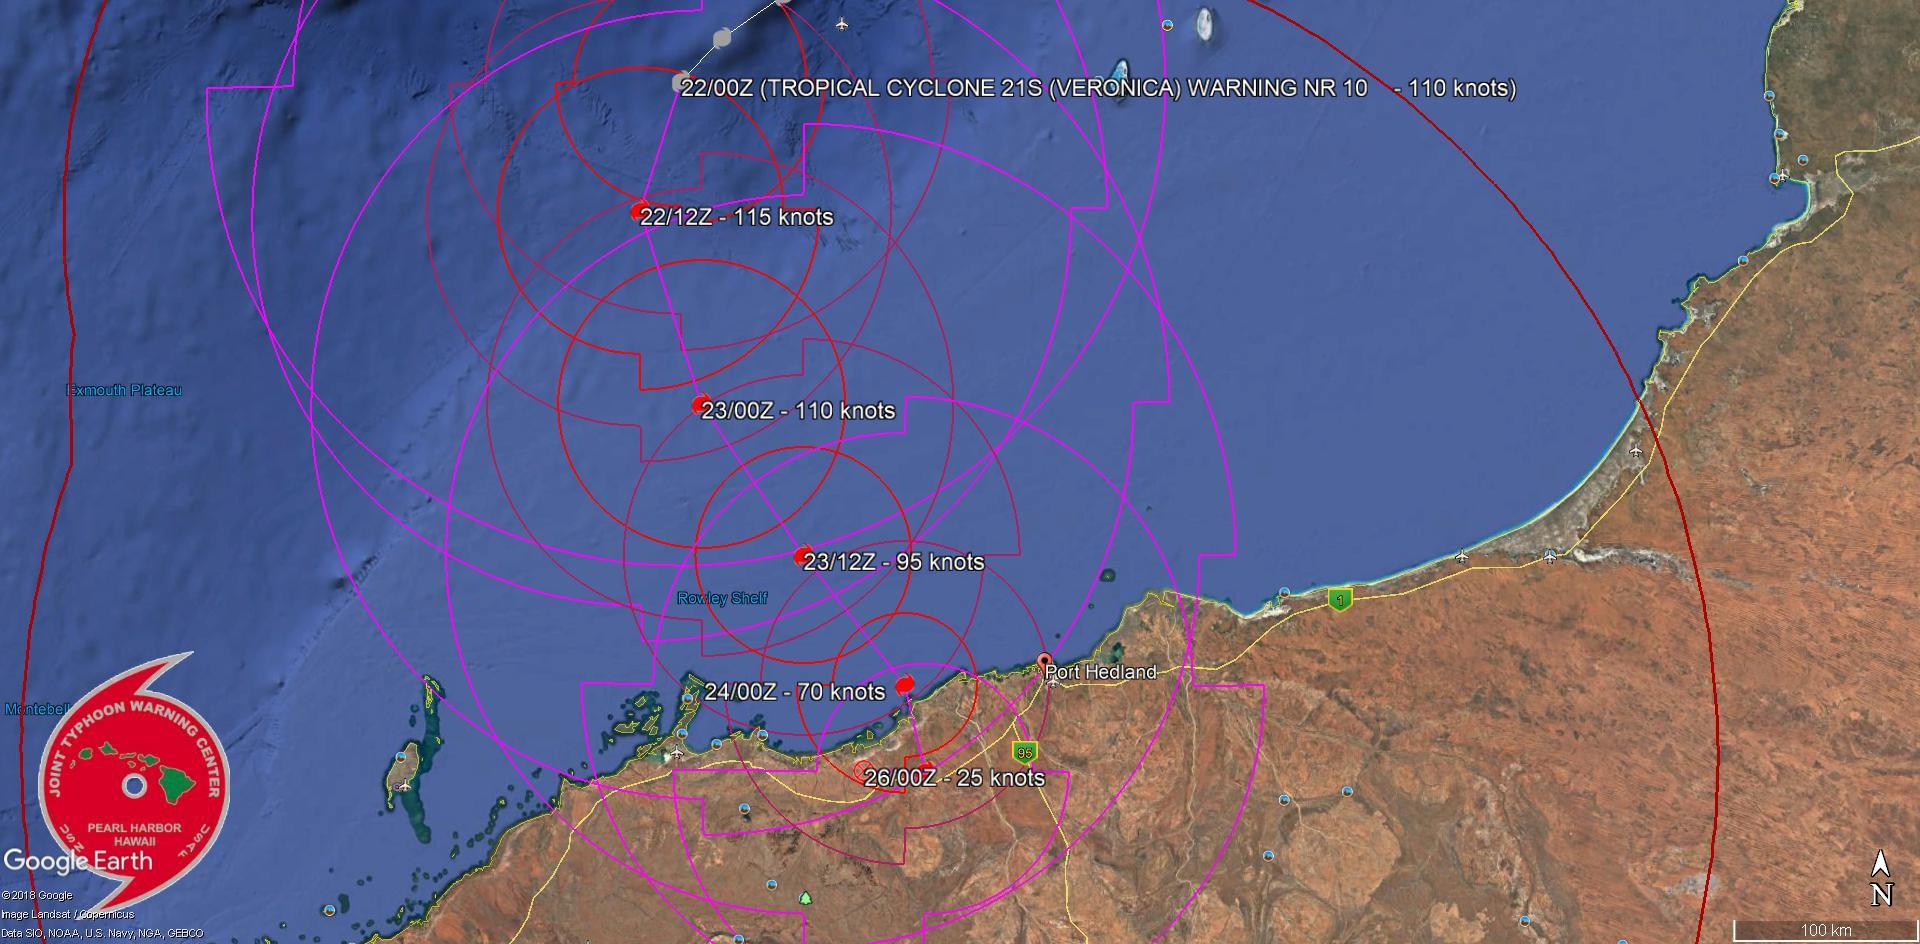 WARNING 10/JTWC